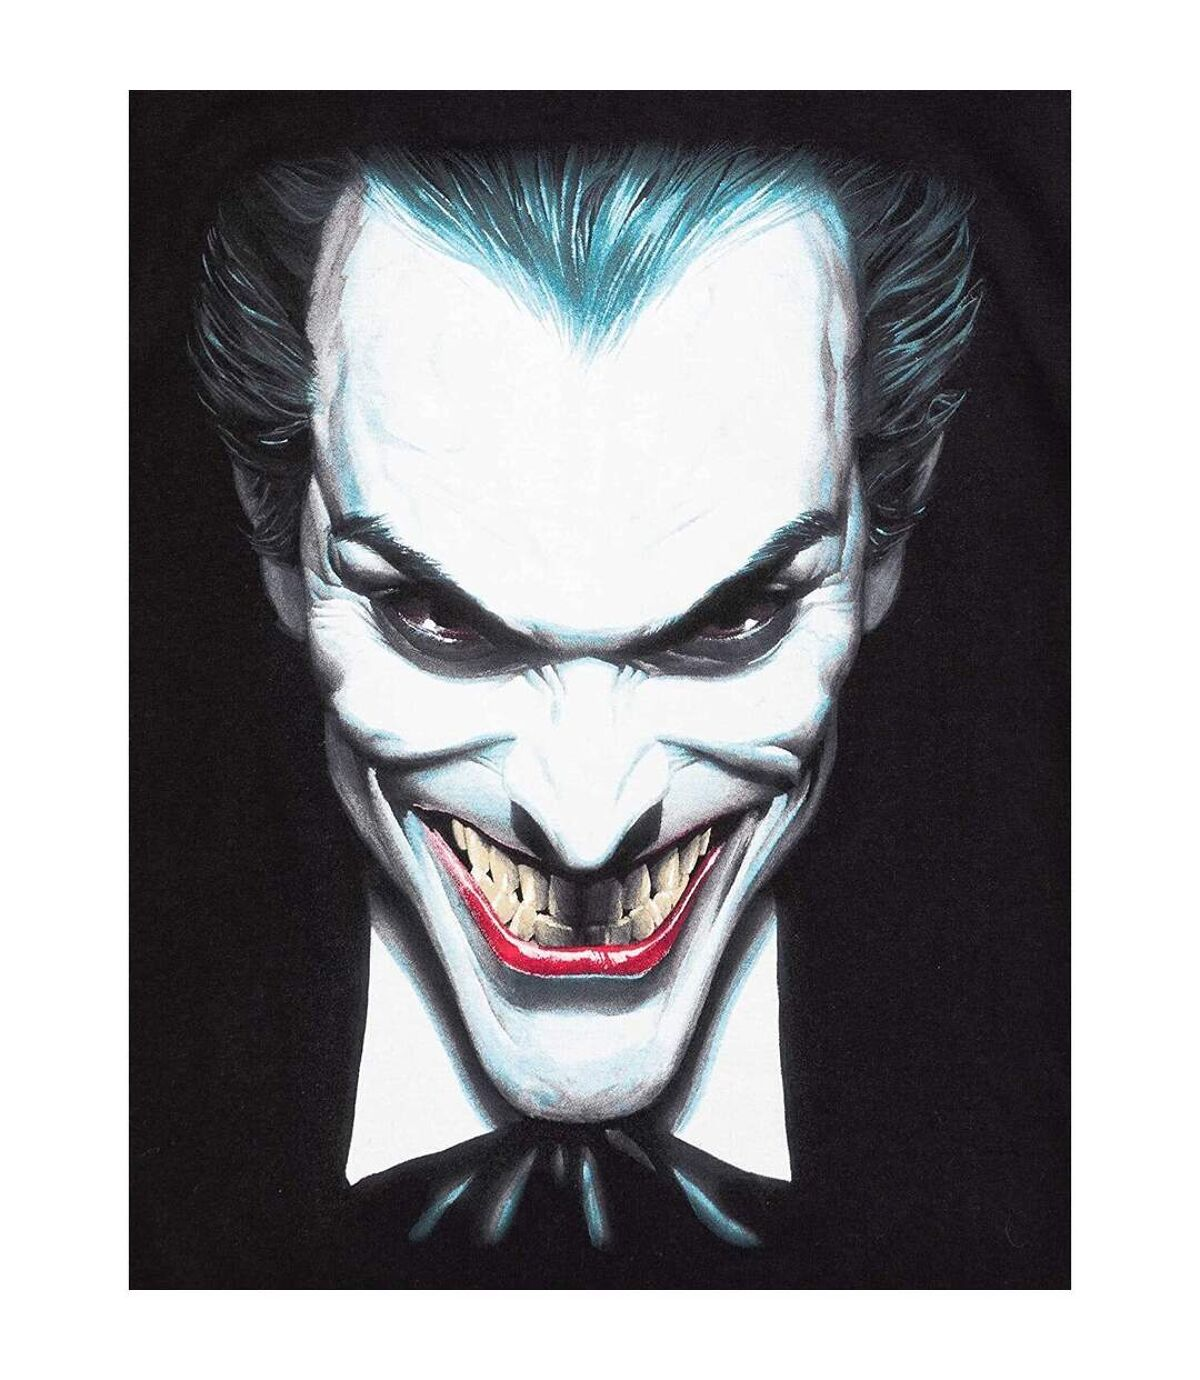 The Joker Mens Face T-Shirt (Black) - UTNS5765